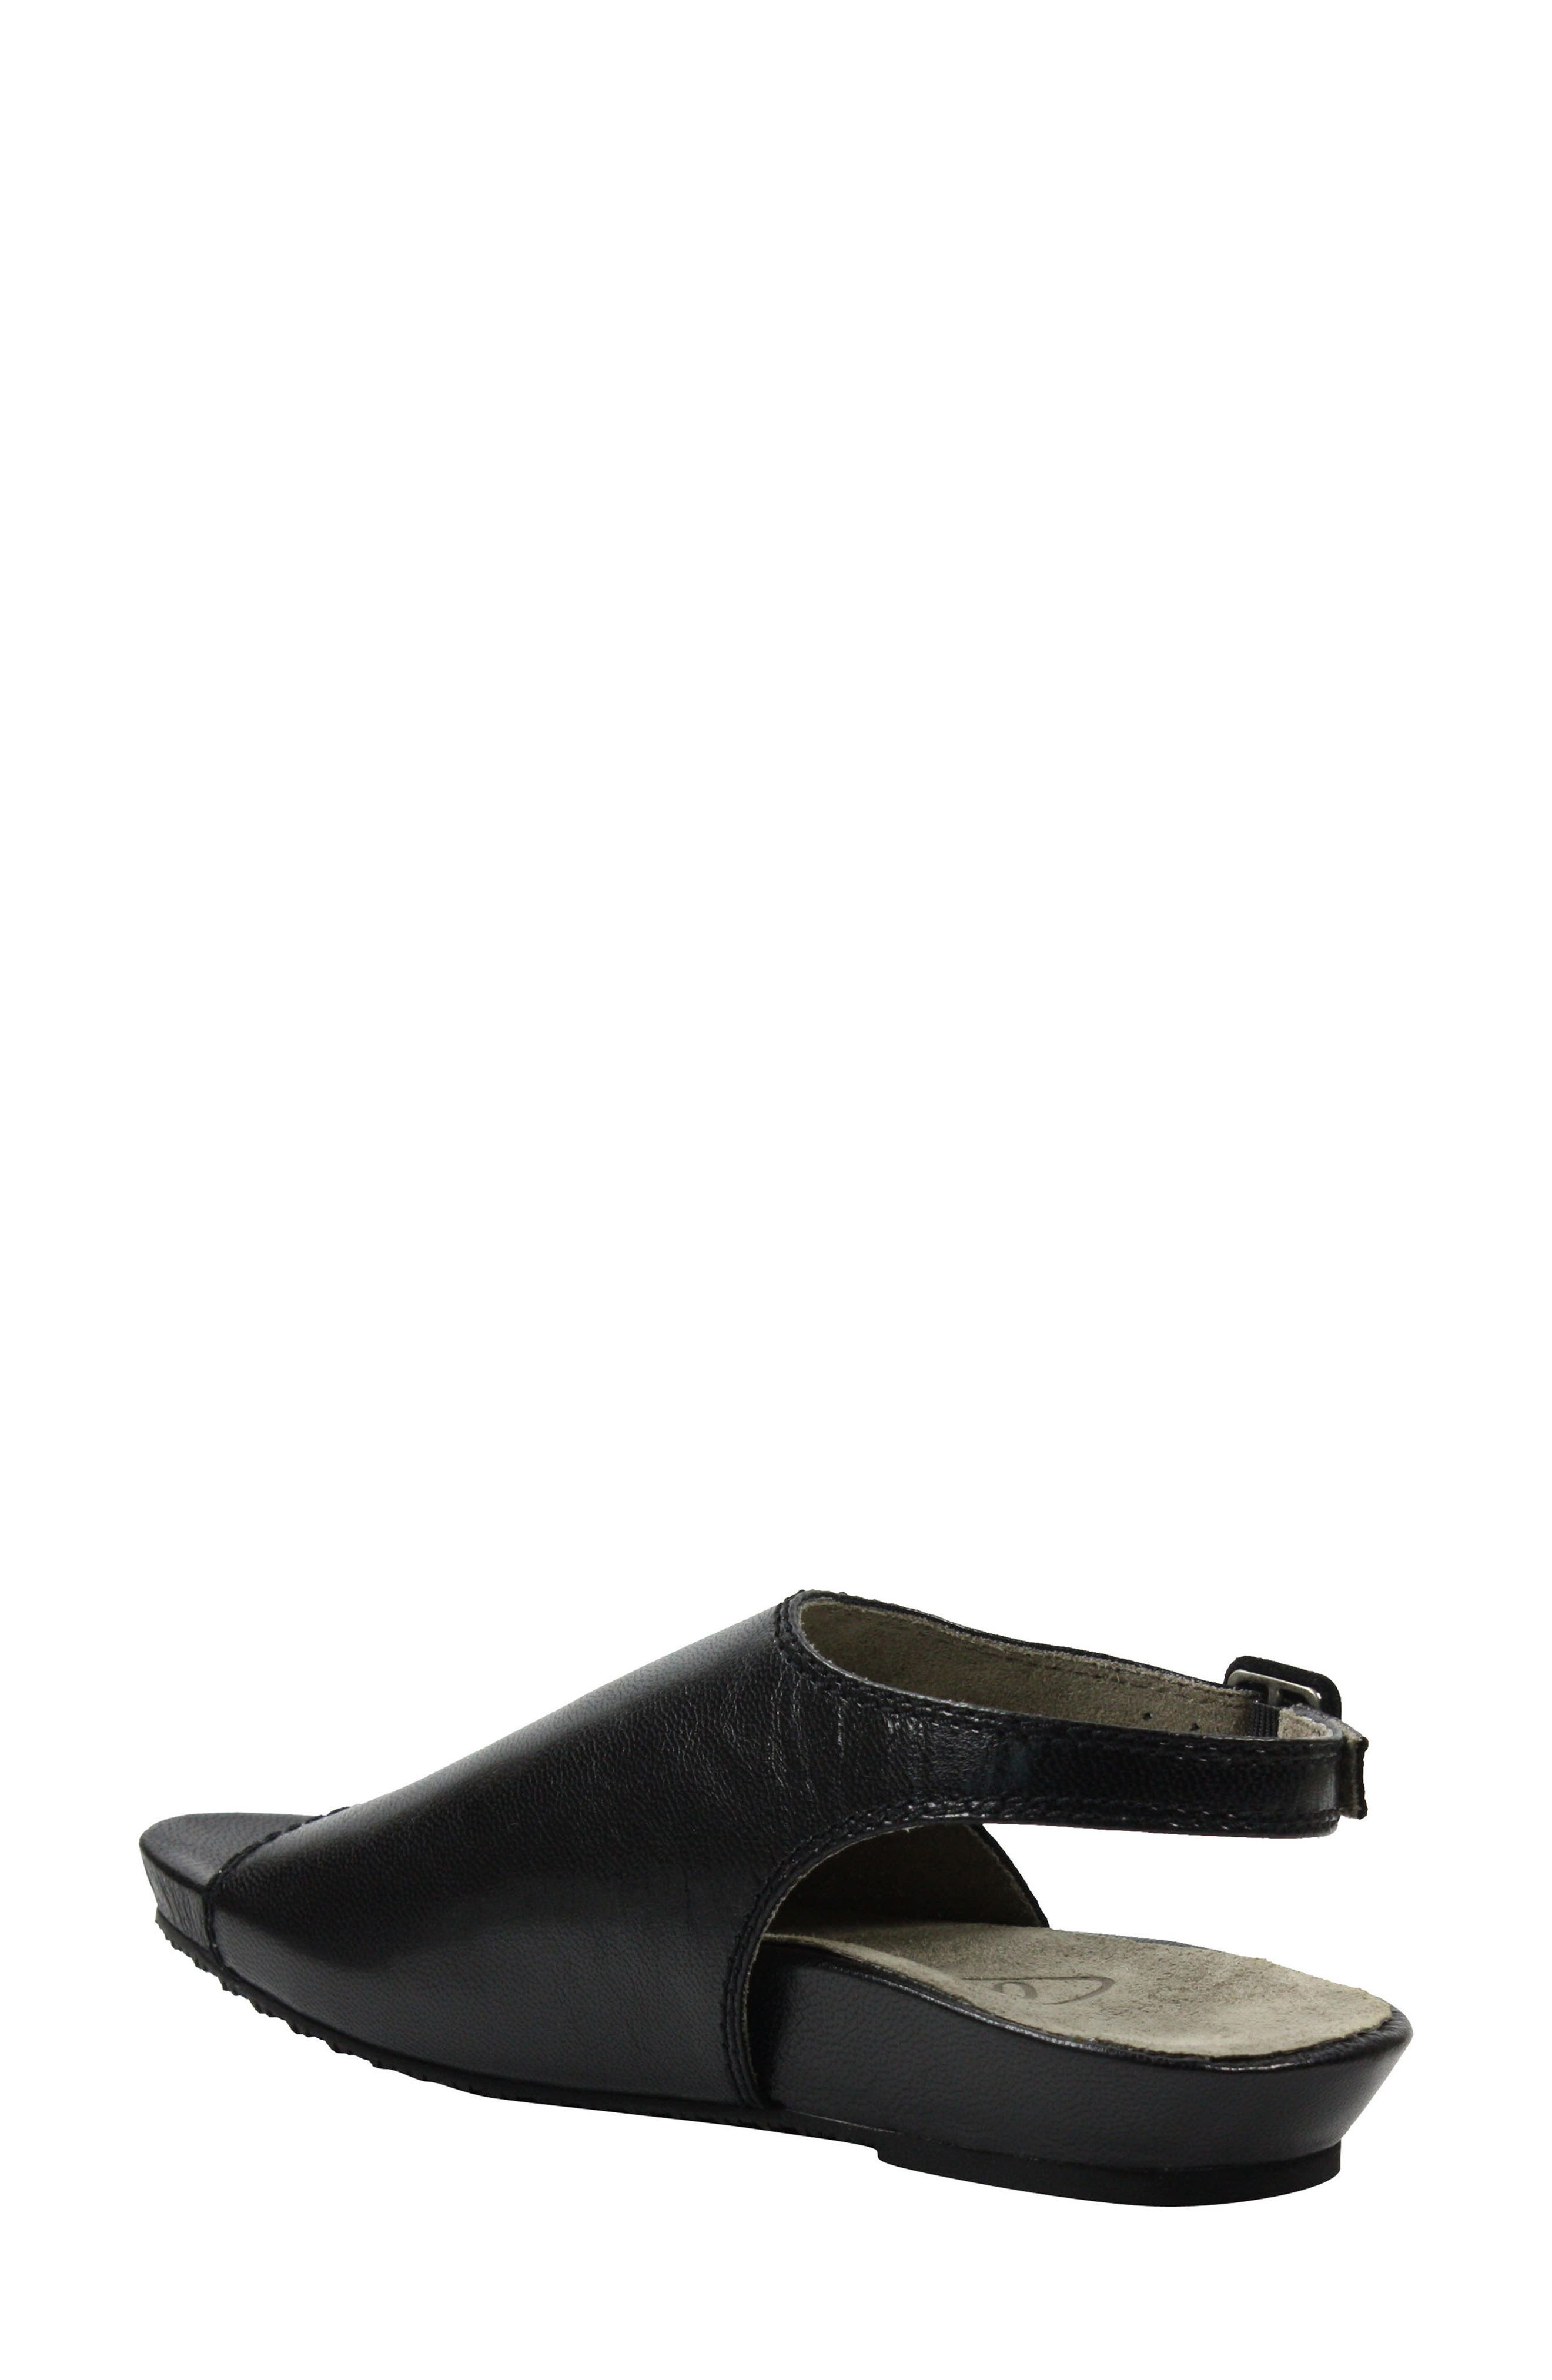 Dalenna Ankle Strap Sandal,                             Alternate thumbnail 2, color,                             Black Leather